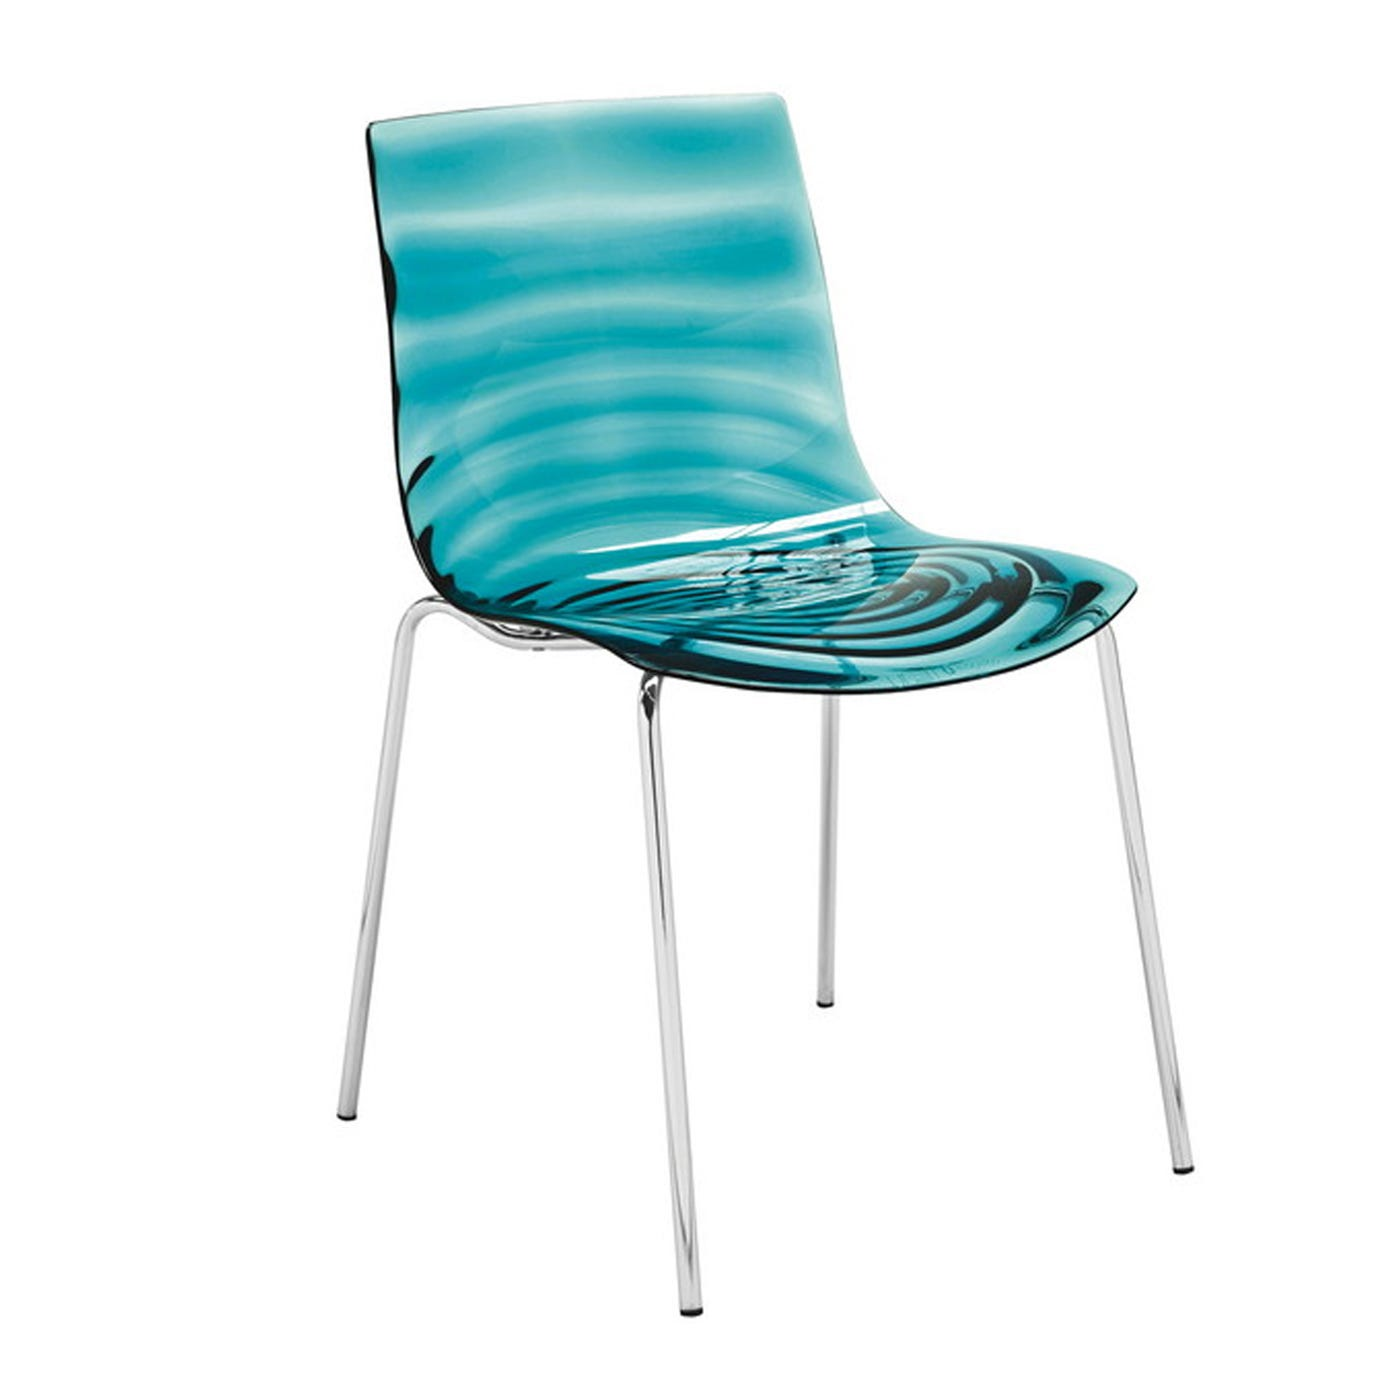 L'eau Dining Chair Aqua Blue cm Cs/1273 - Warehouse Sale